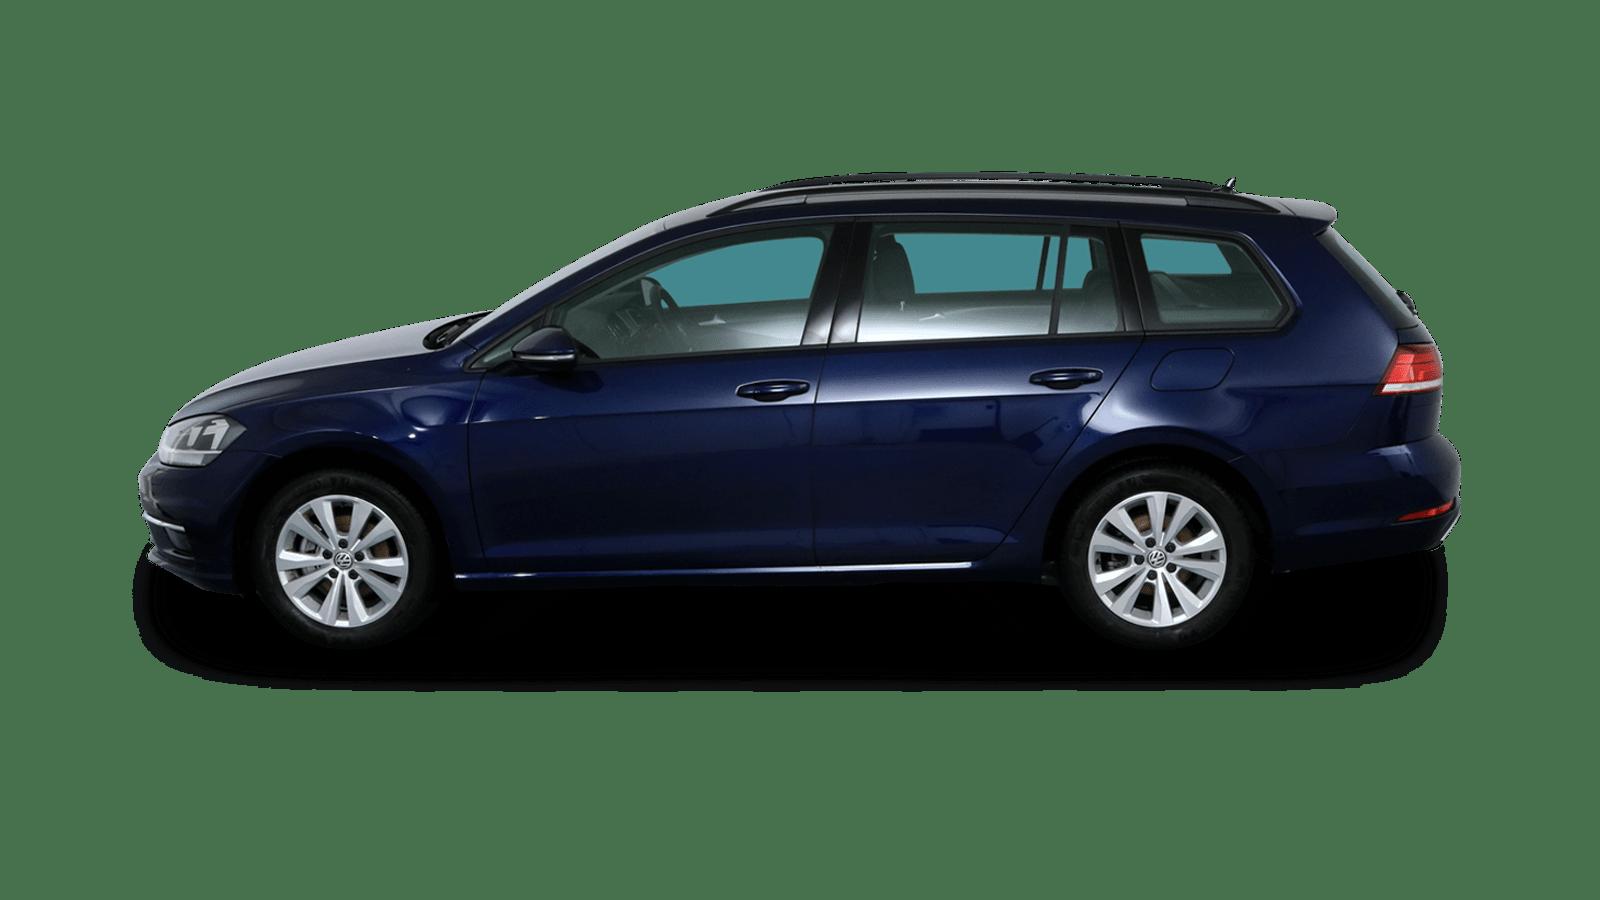 VW Golf Variant Blue back - Clyde car subscription